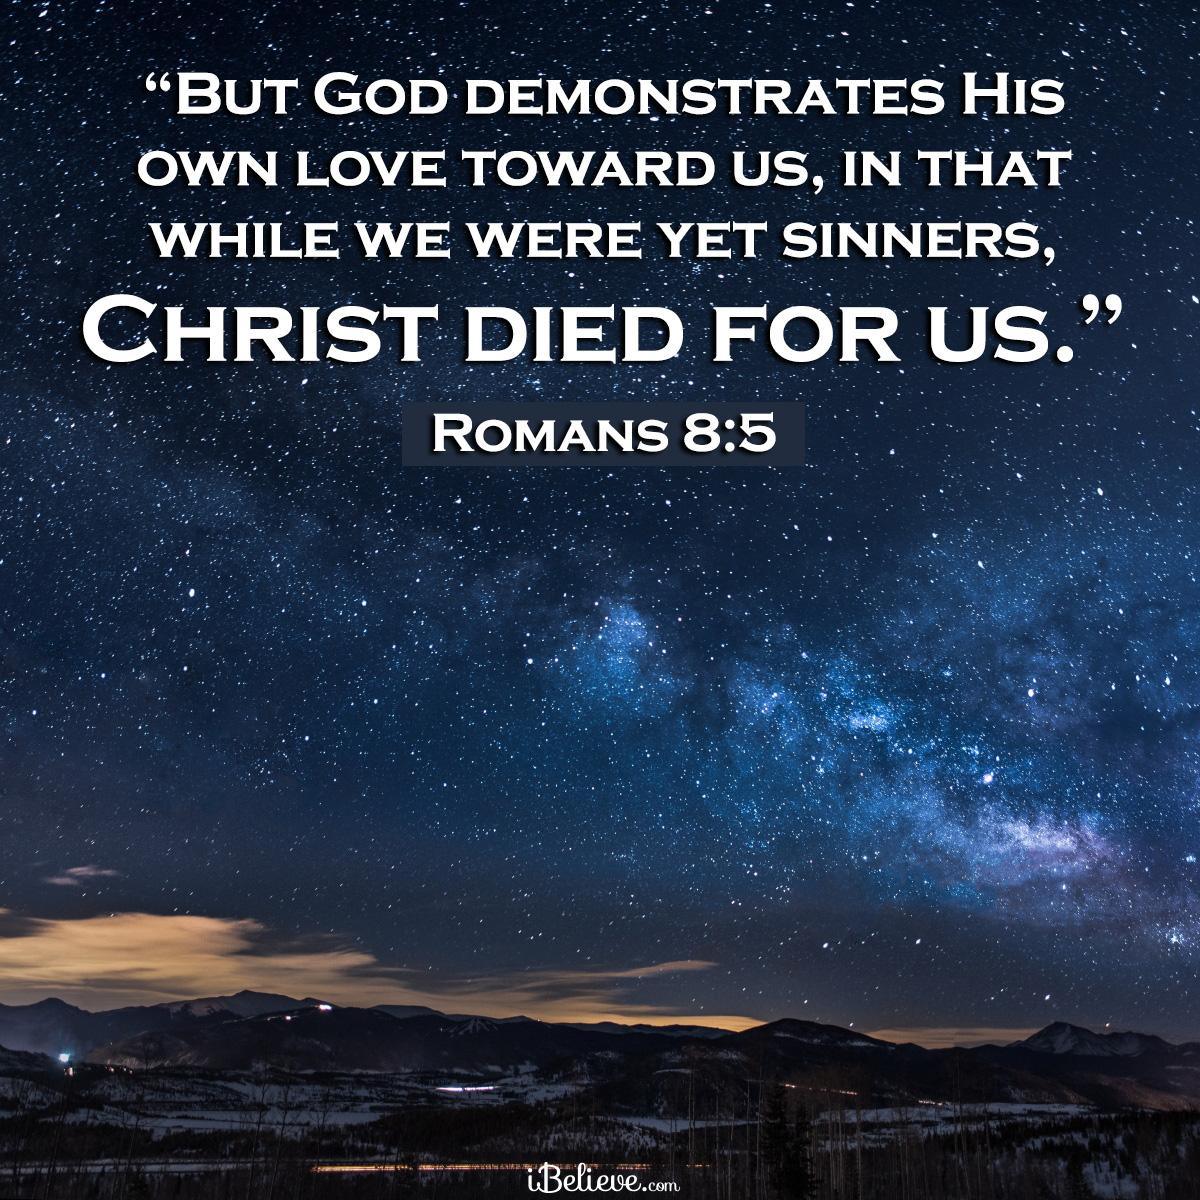 Romans 8:5, inspirational image